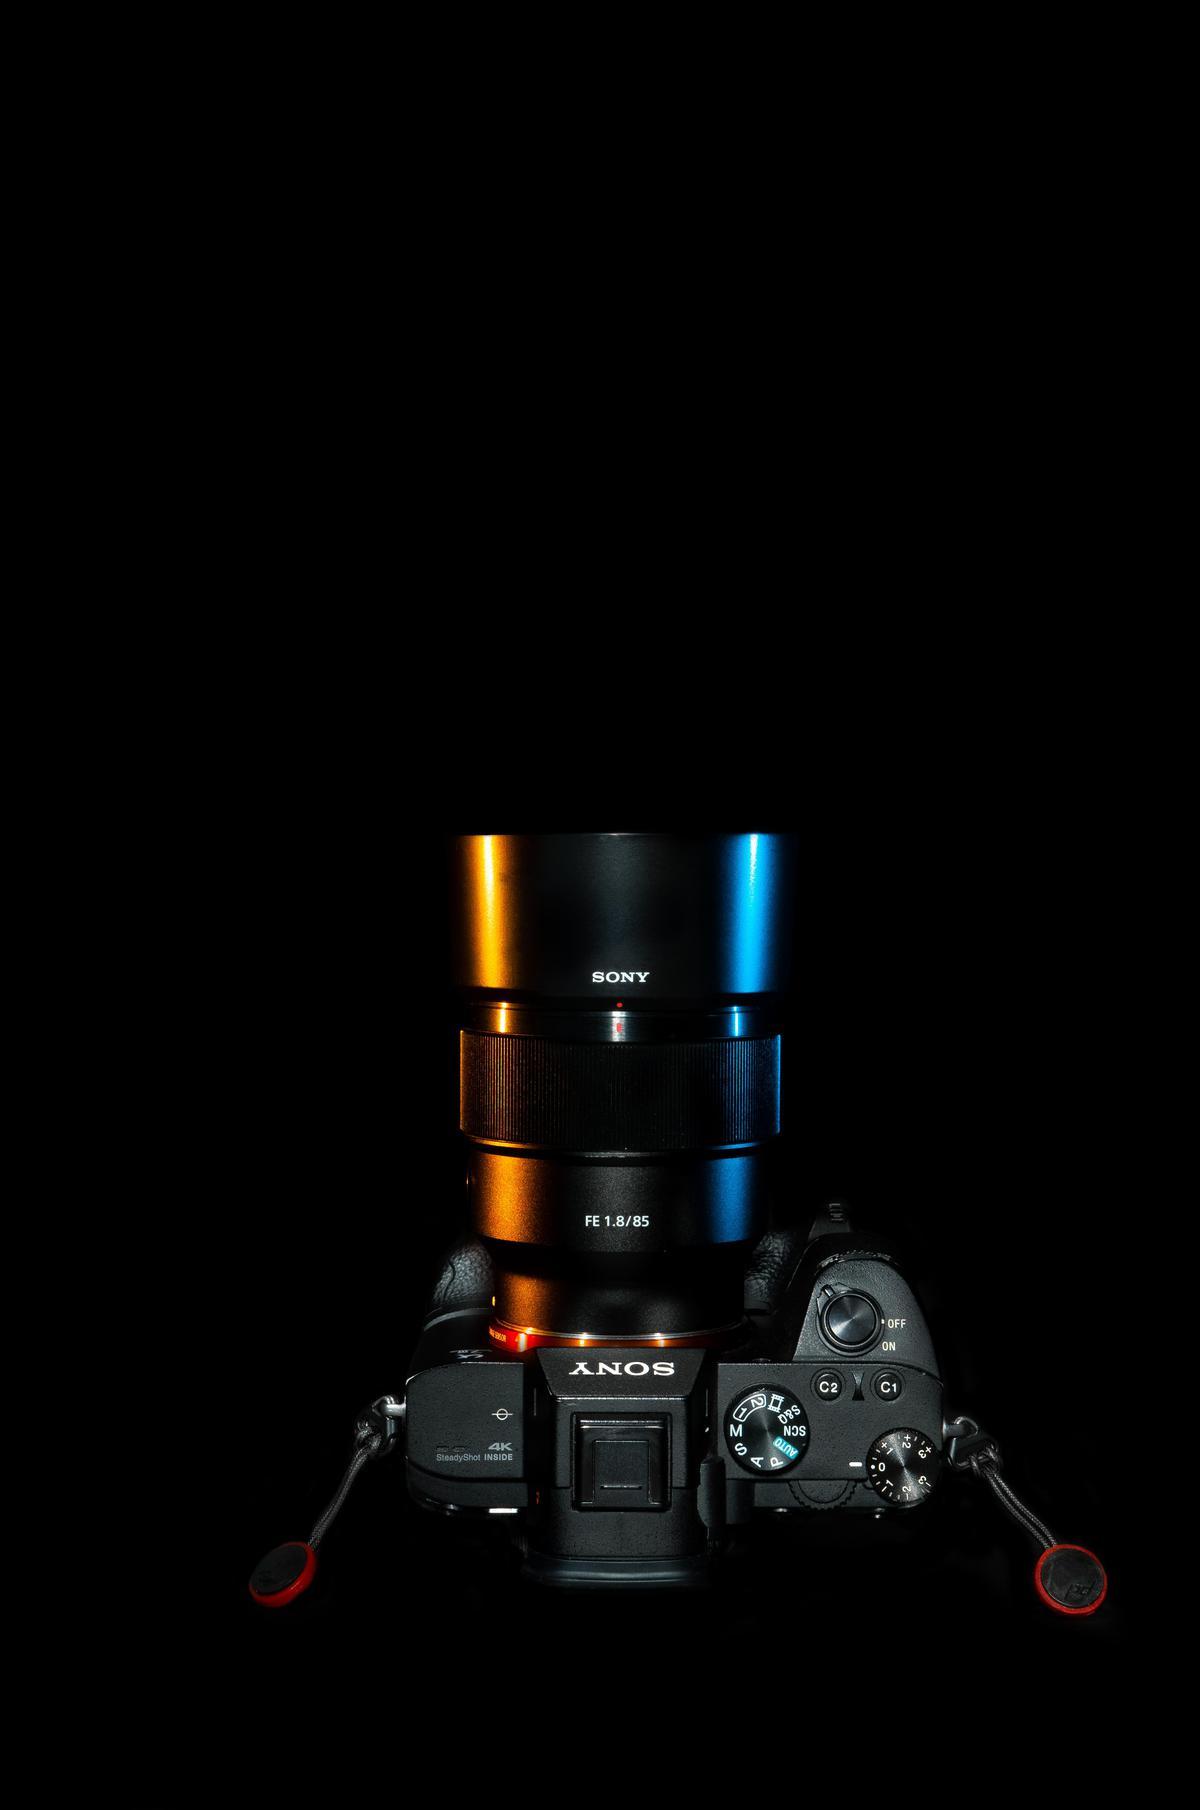 Image of Cameras & optics etc.